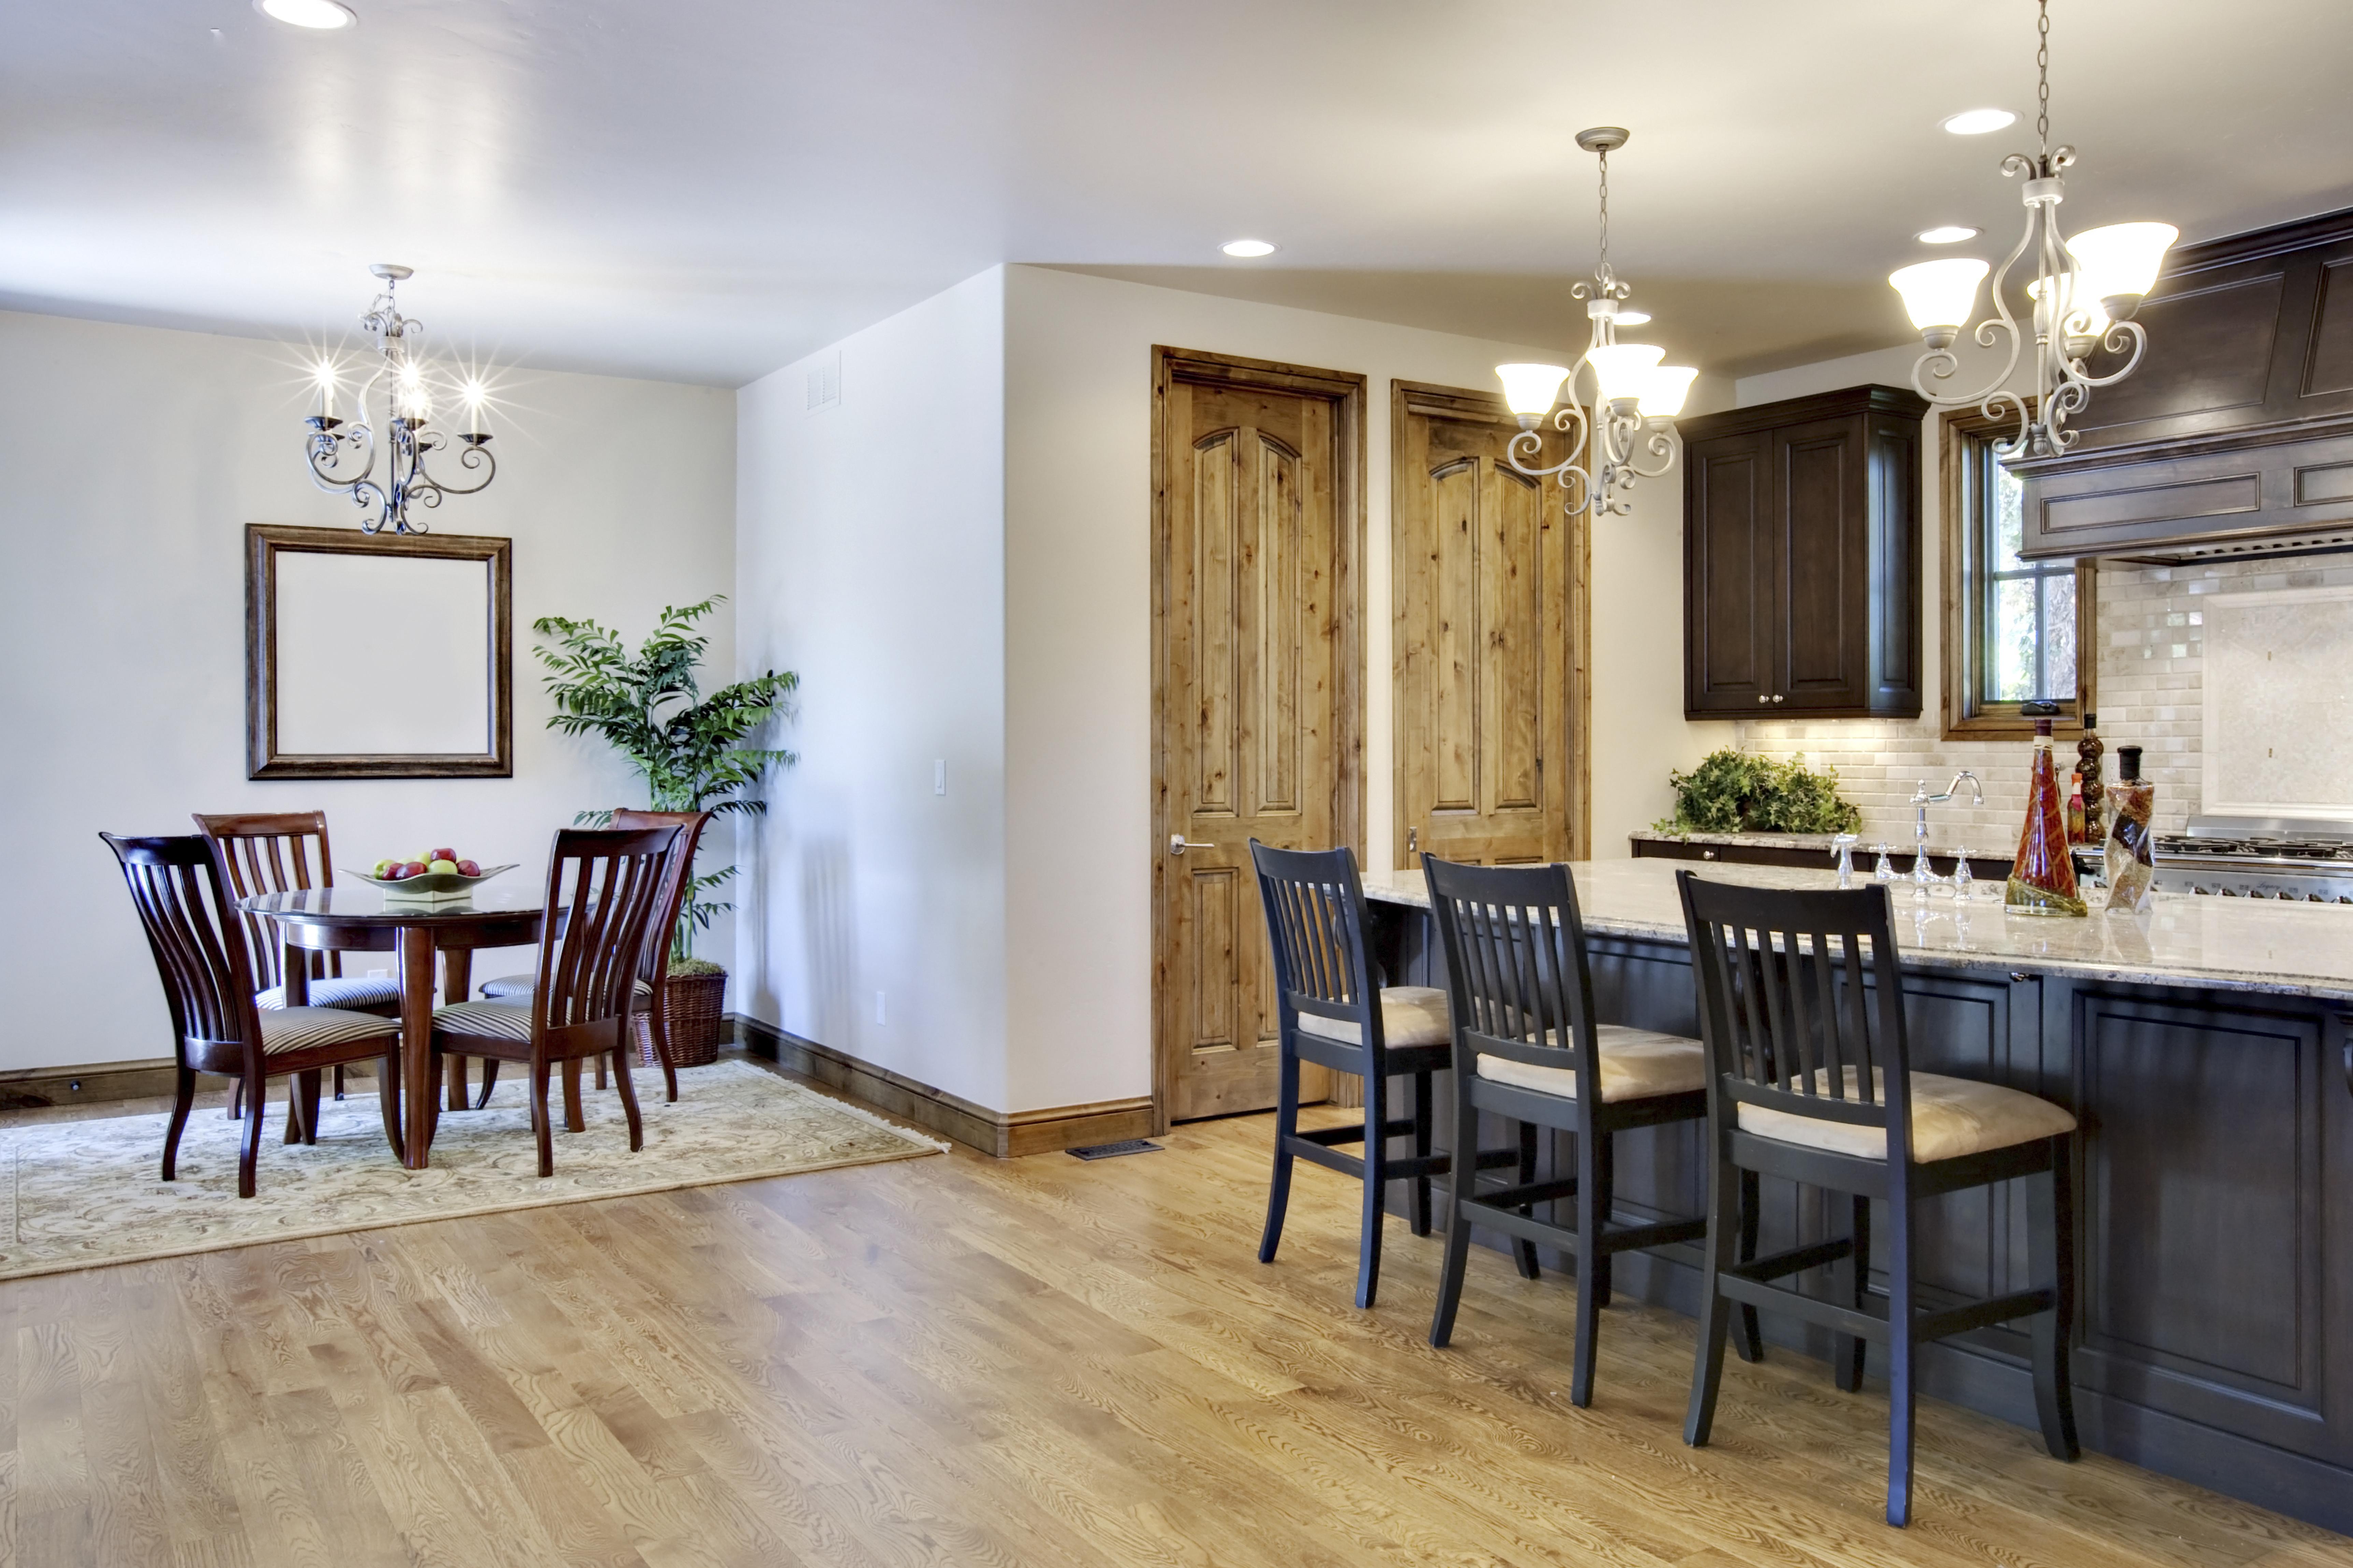 Kitchen Remodeling Contractor Princeton NJ - DES